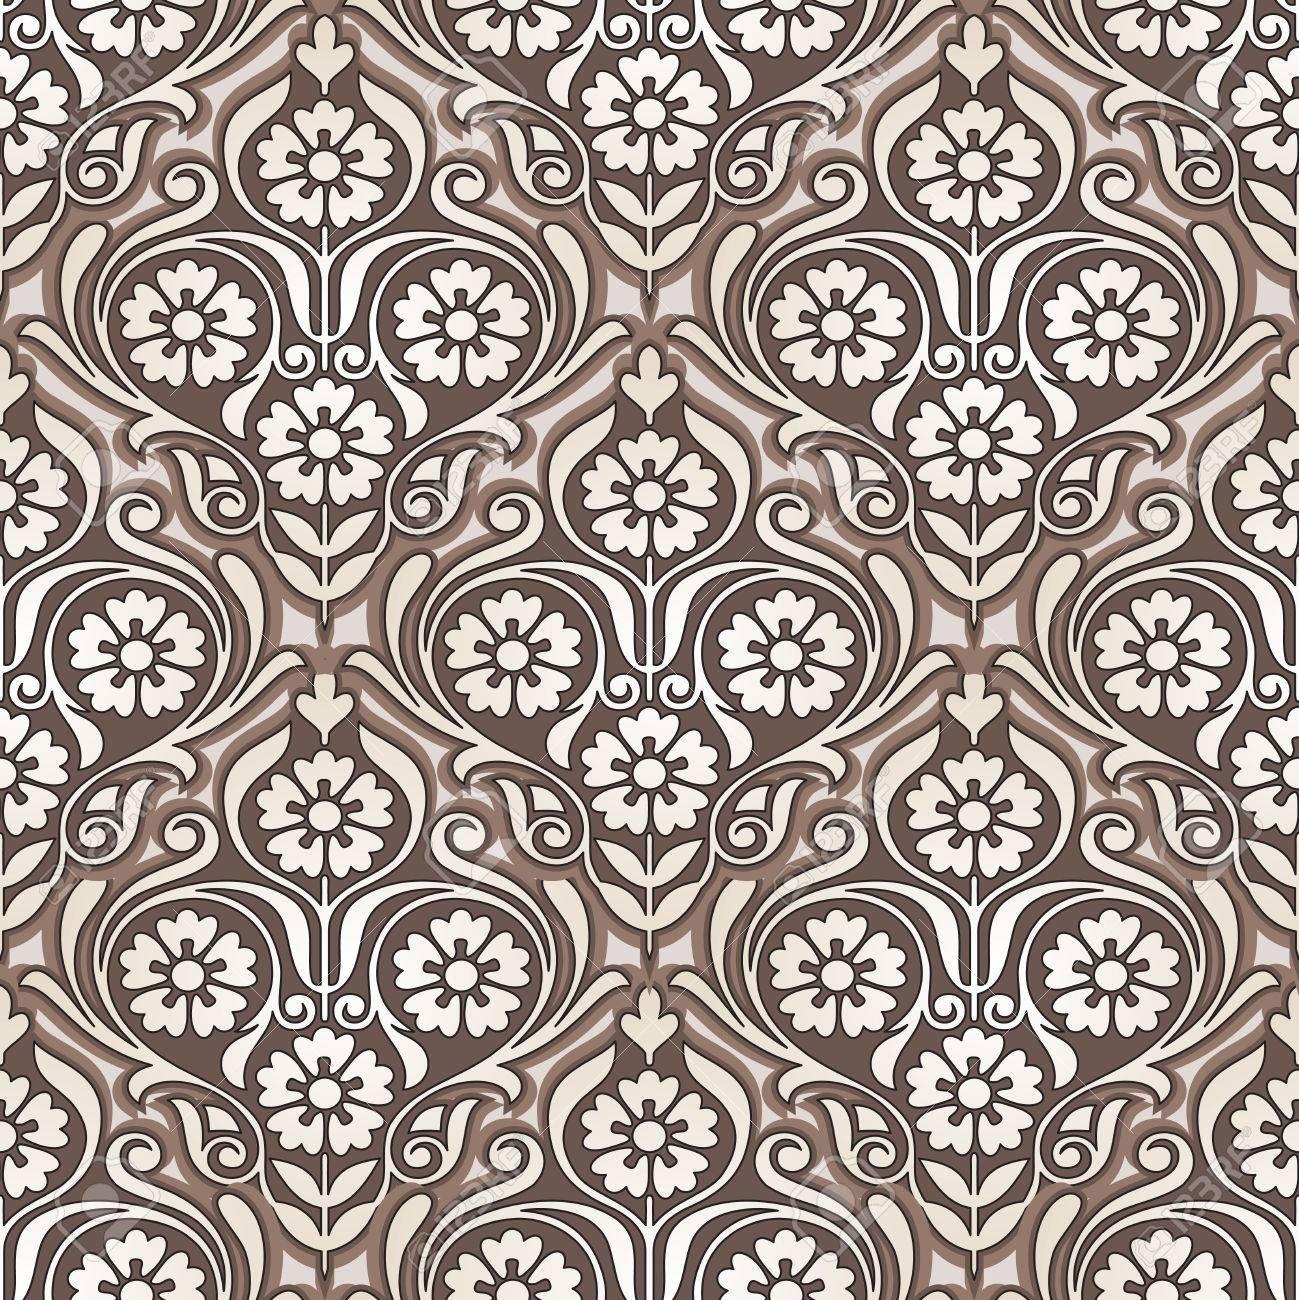 Seamless Golden Flower Wallpaper Design Stock Vector